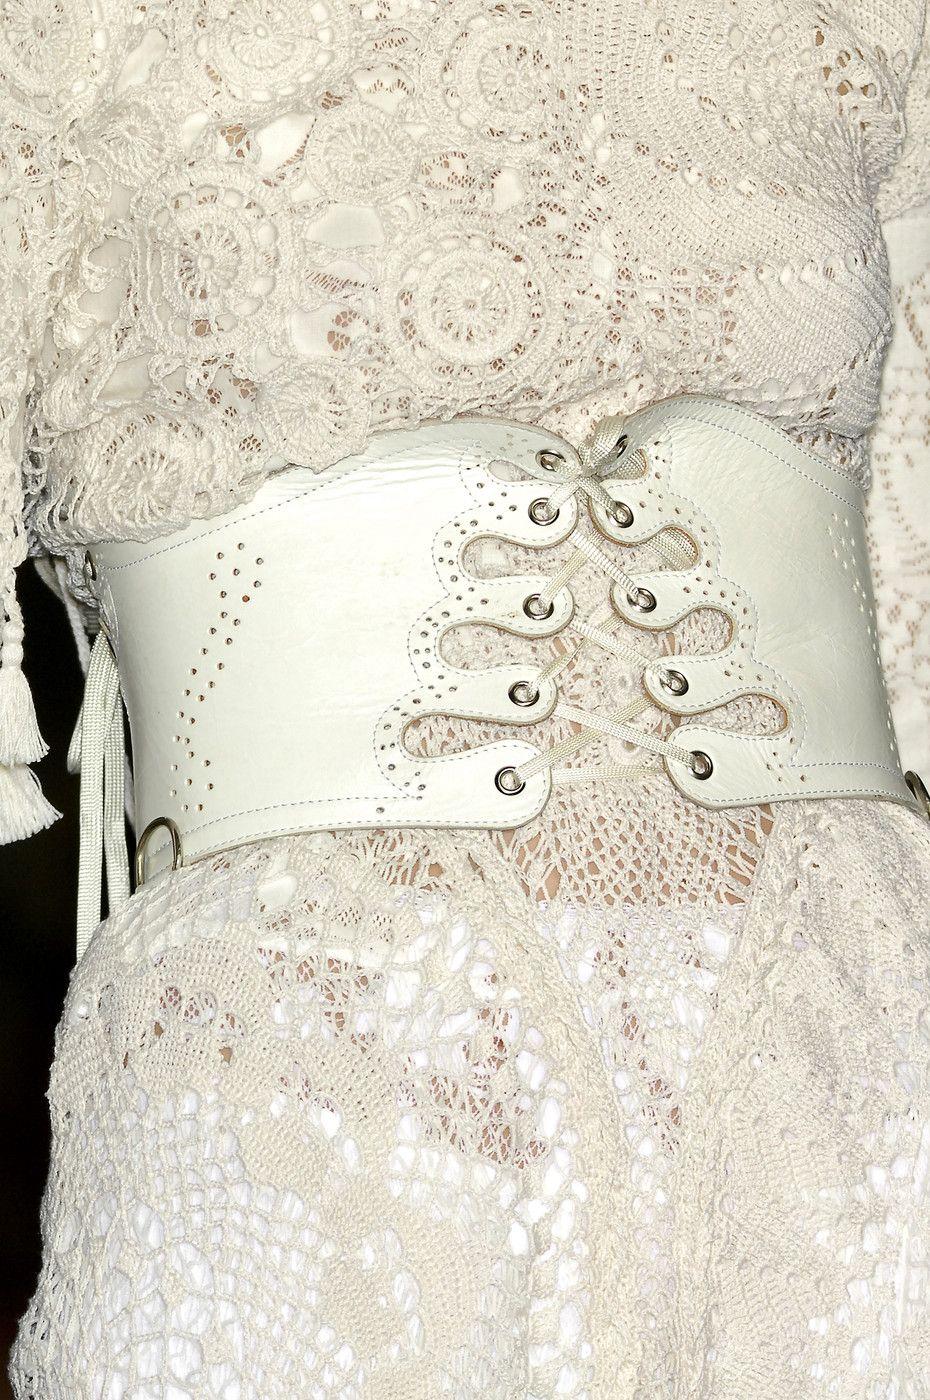 Jean Paul Gaultier at Paris Fashion Week Spring 2008 - Details